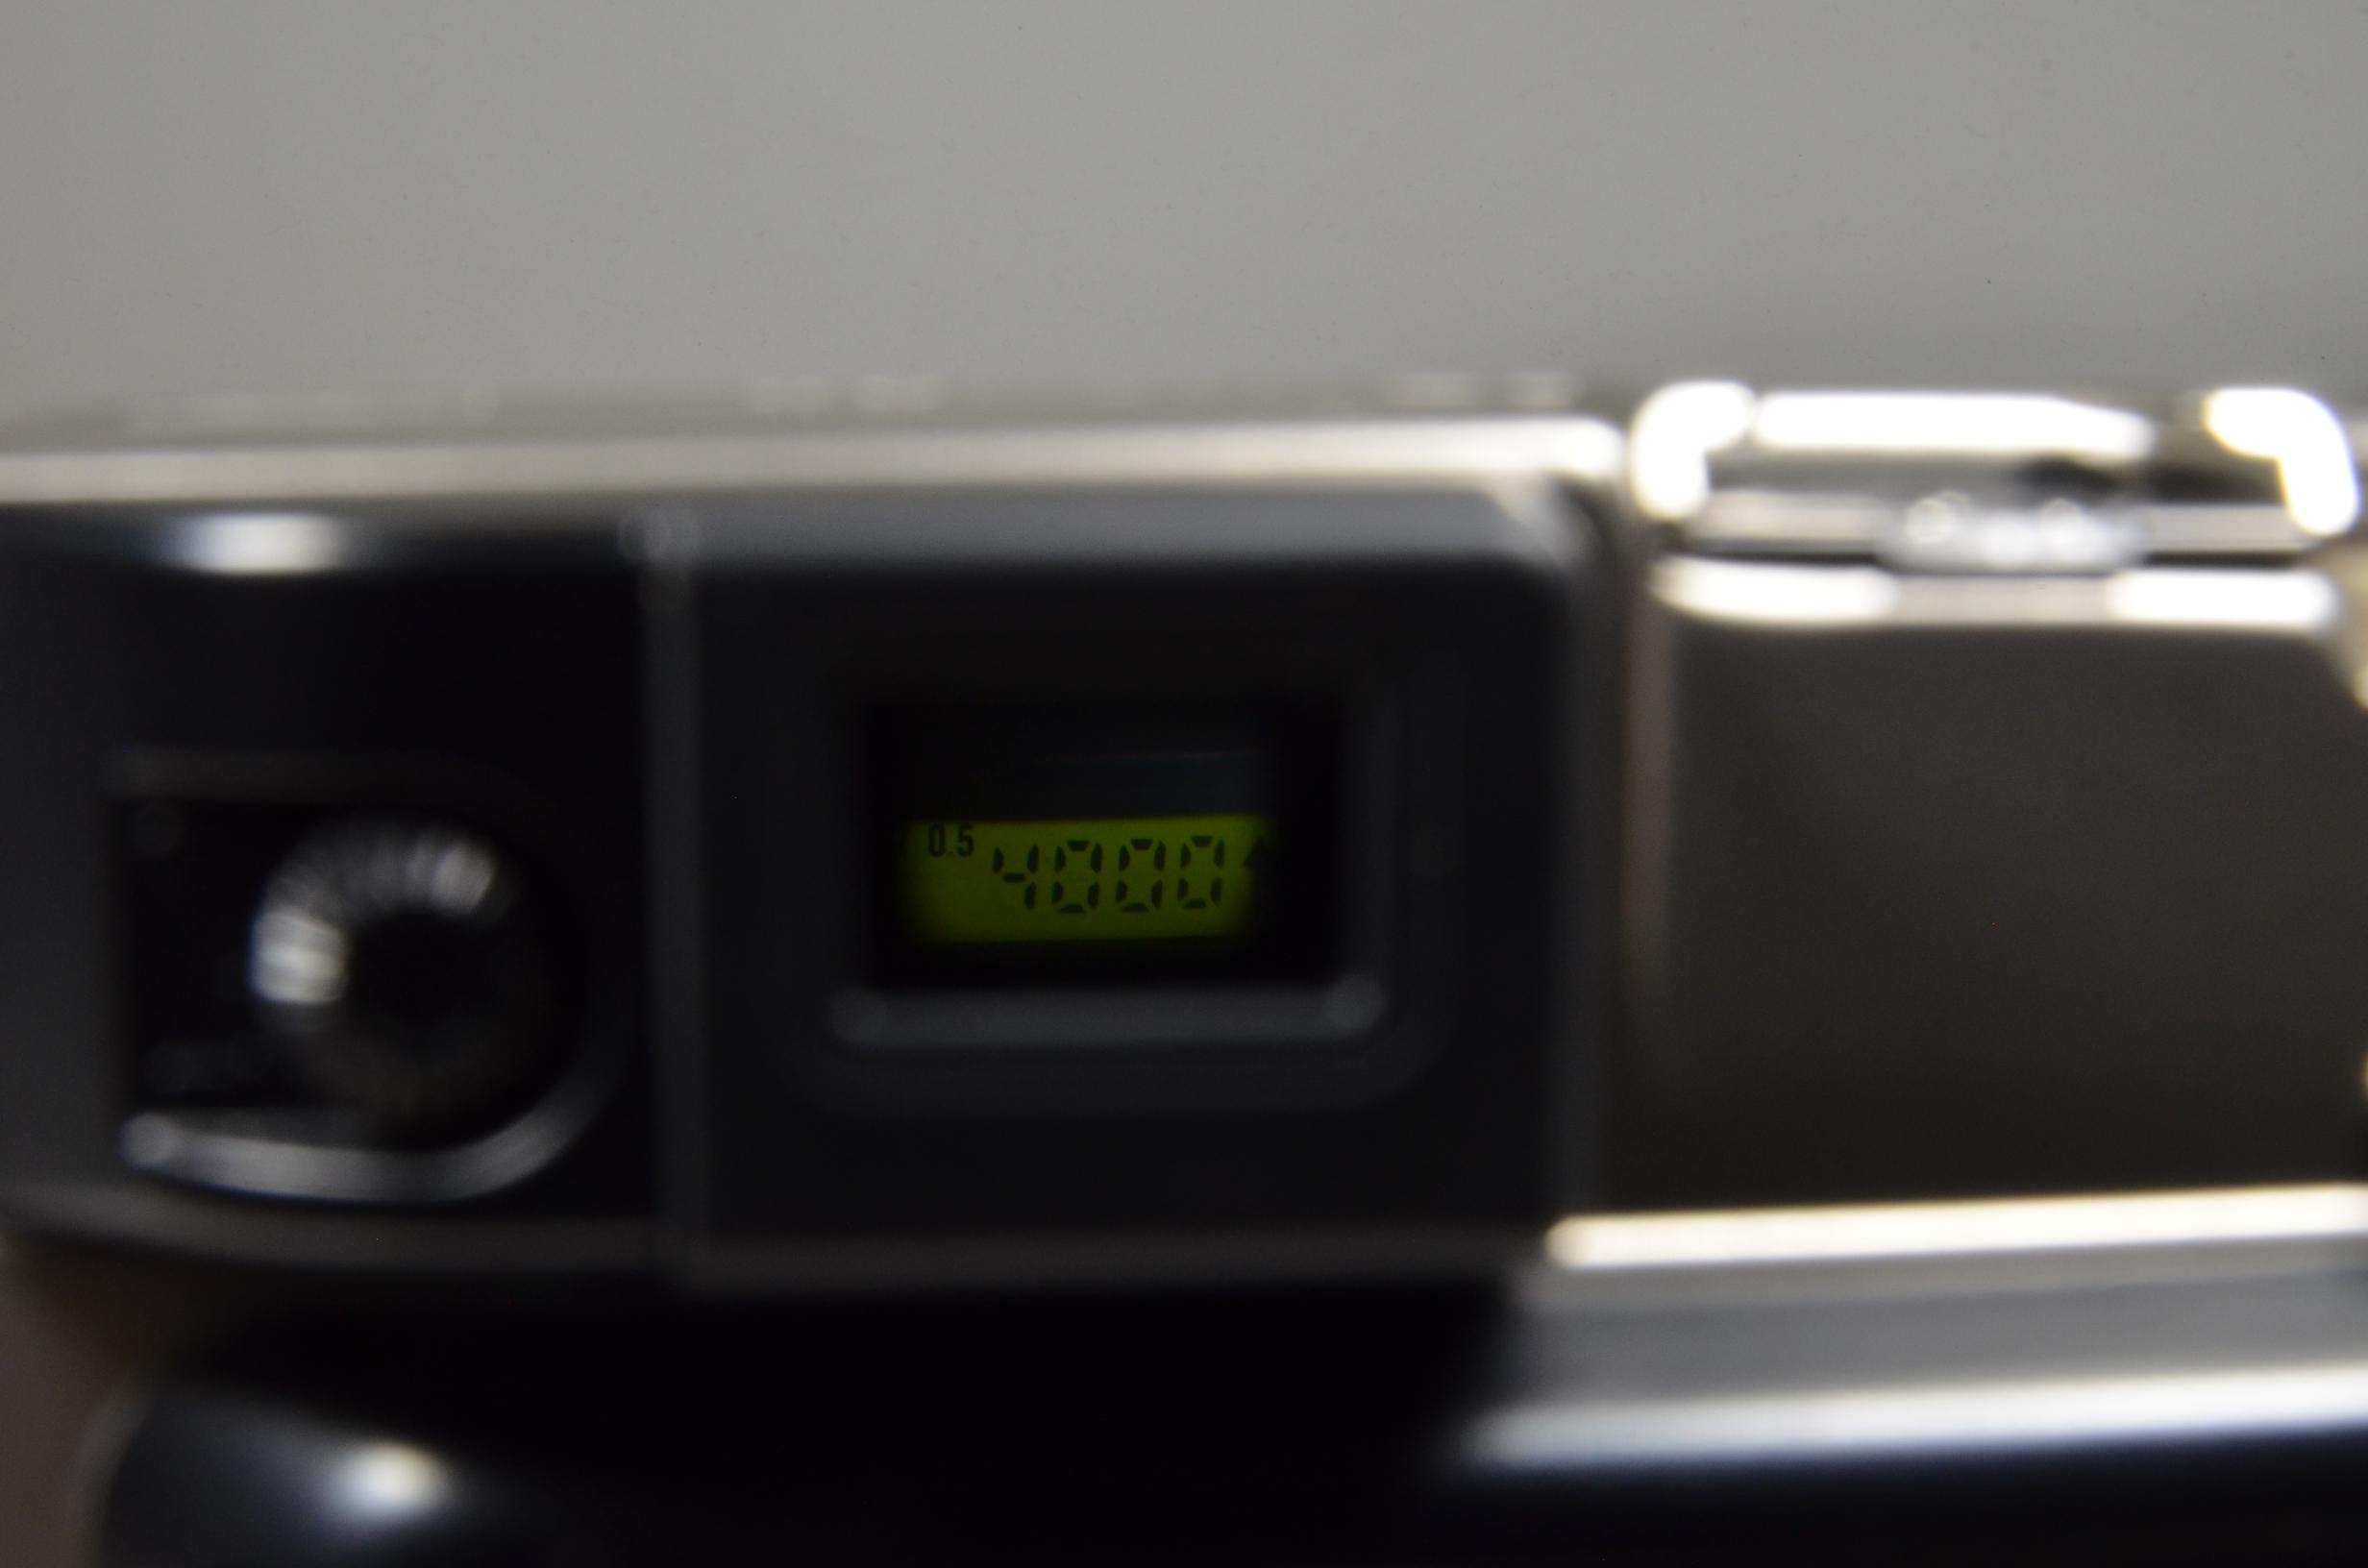 contax g2 databack camera / planar 45mm f2 / biogon 28mm f2.8 / sonnar 90mm f2.8 / tla200